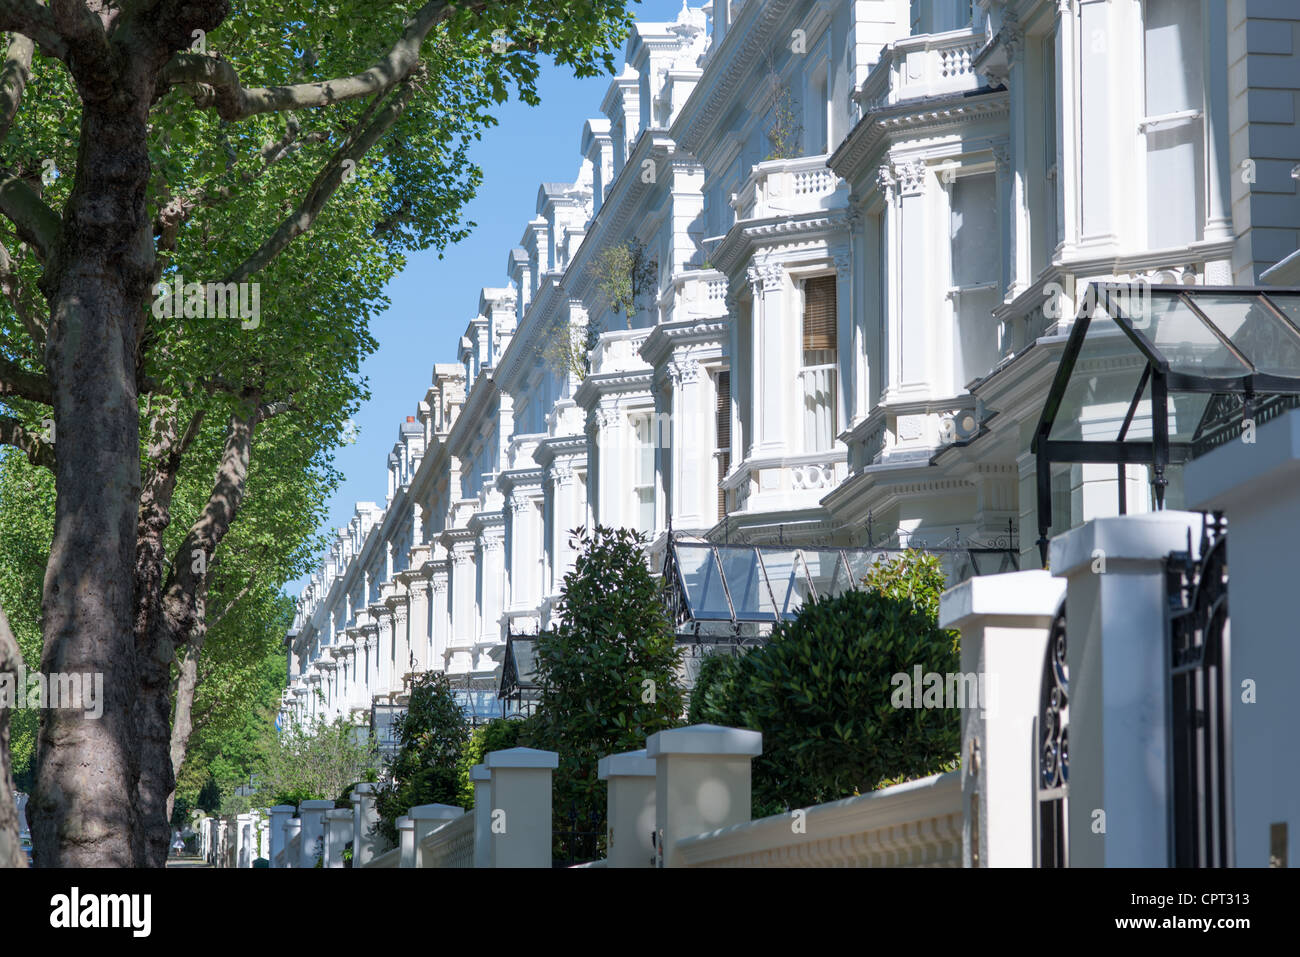 Exklusive Immobilien auf Holland Park W11 im Royal Borough of Kensington und Chelsea, London, UK. Stockbild